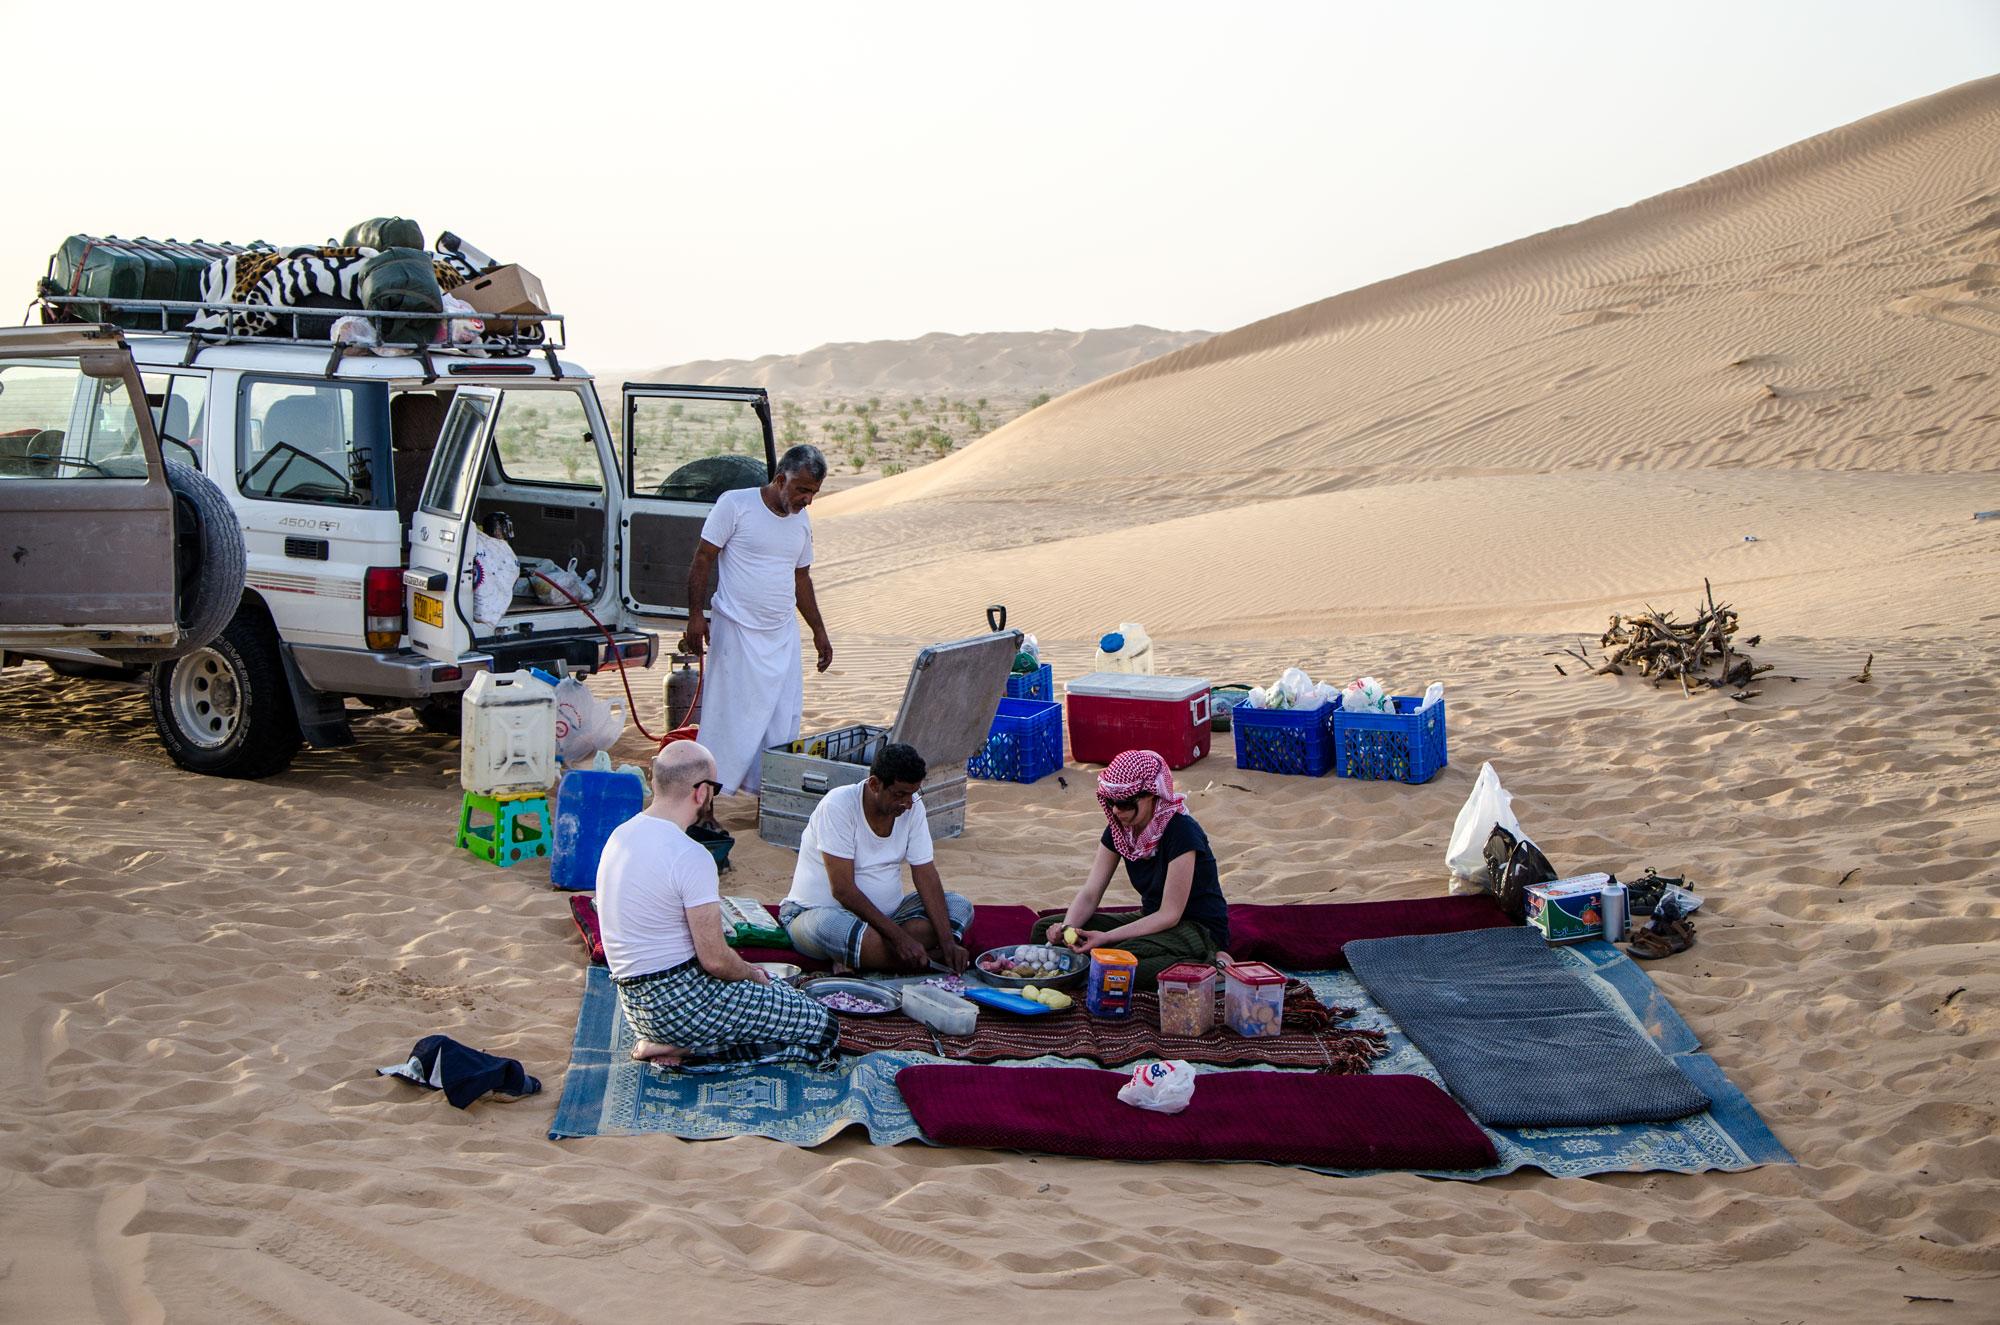 Gemeinsames Kochen im Lager in der Rub' Al-Khali. Foto: Lothar Ruttner